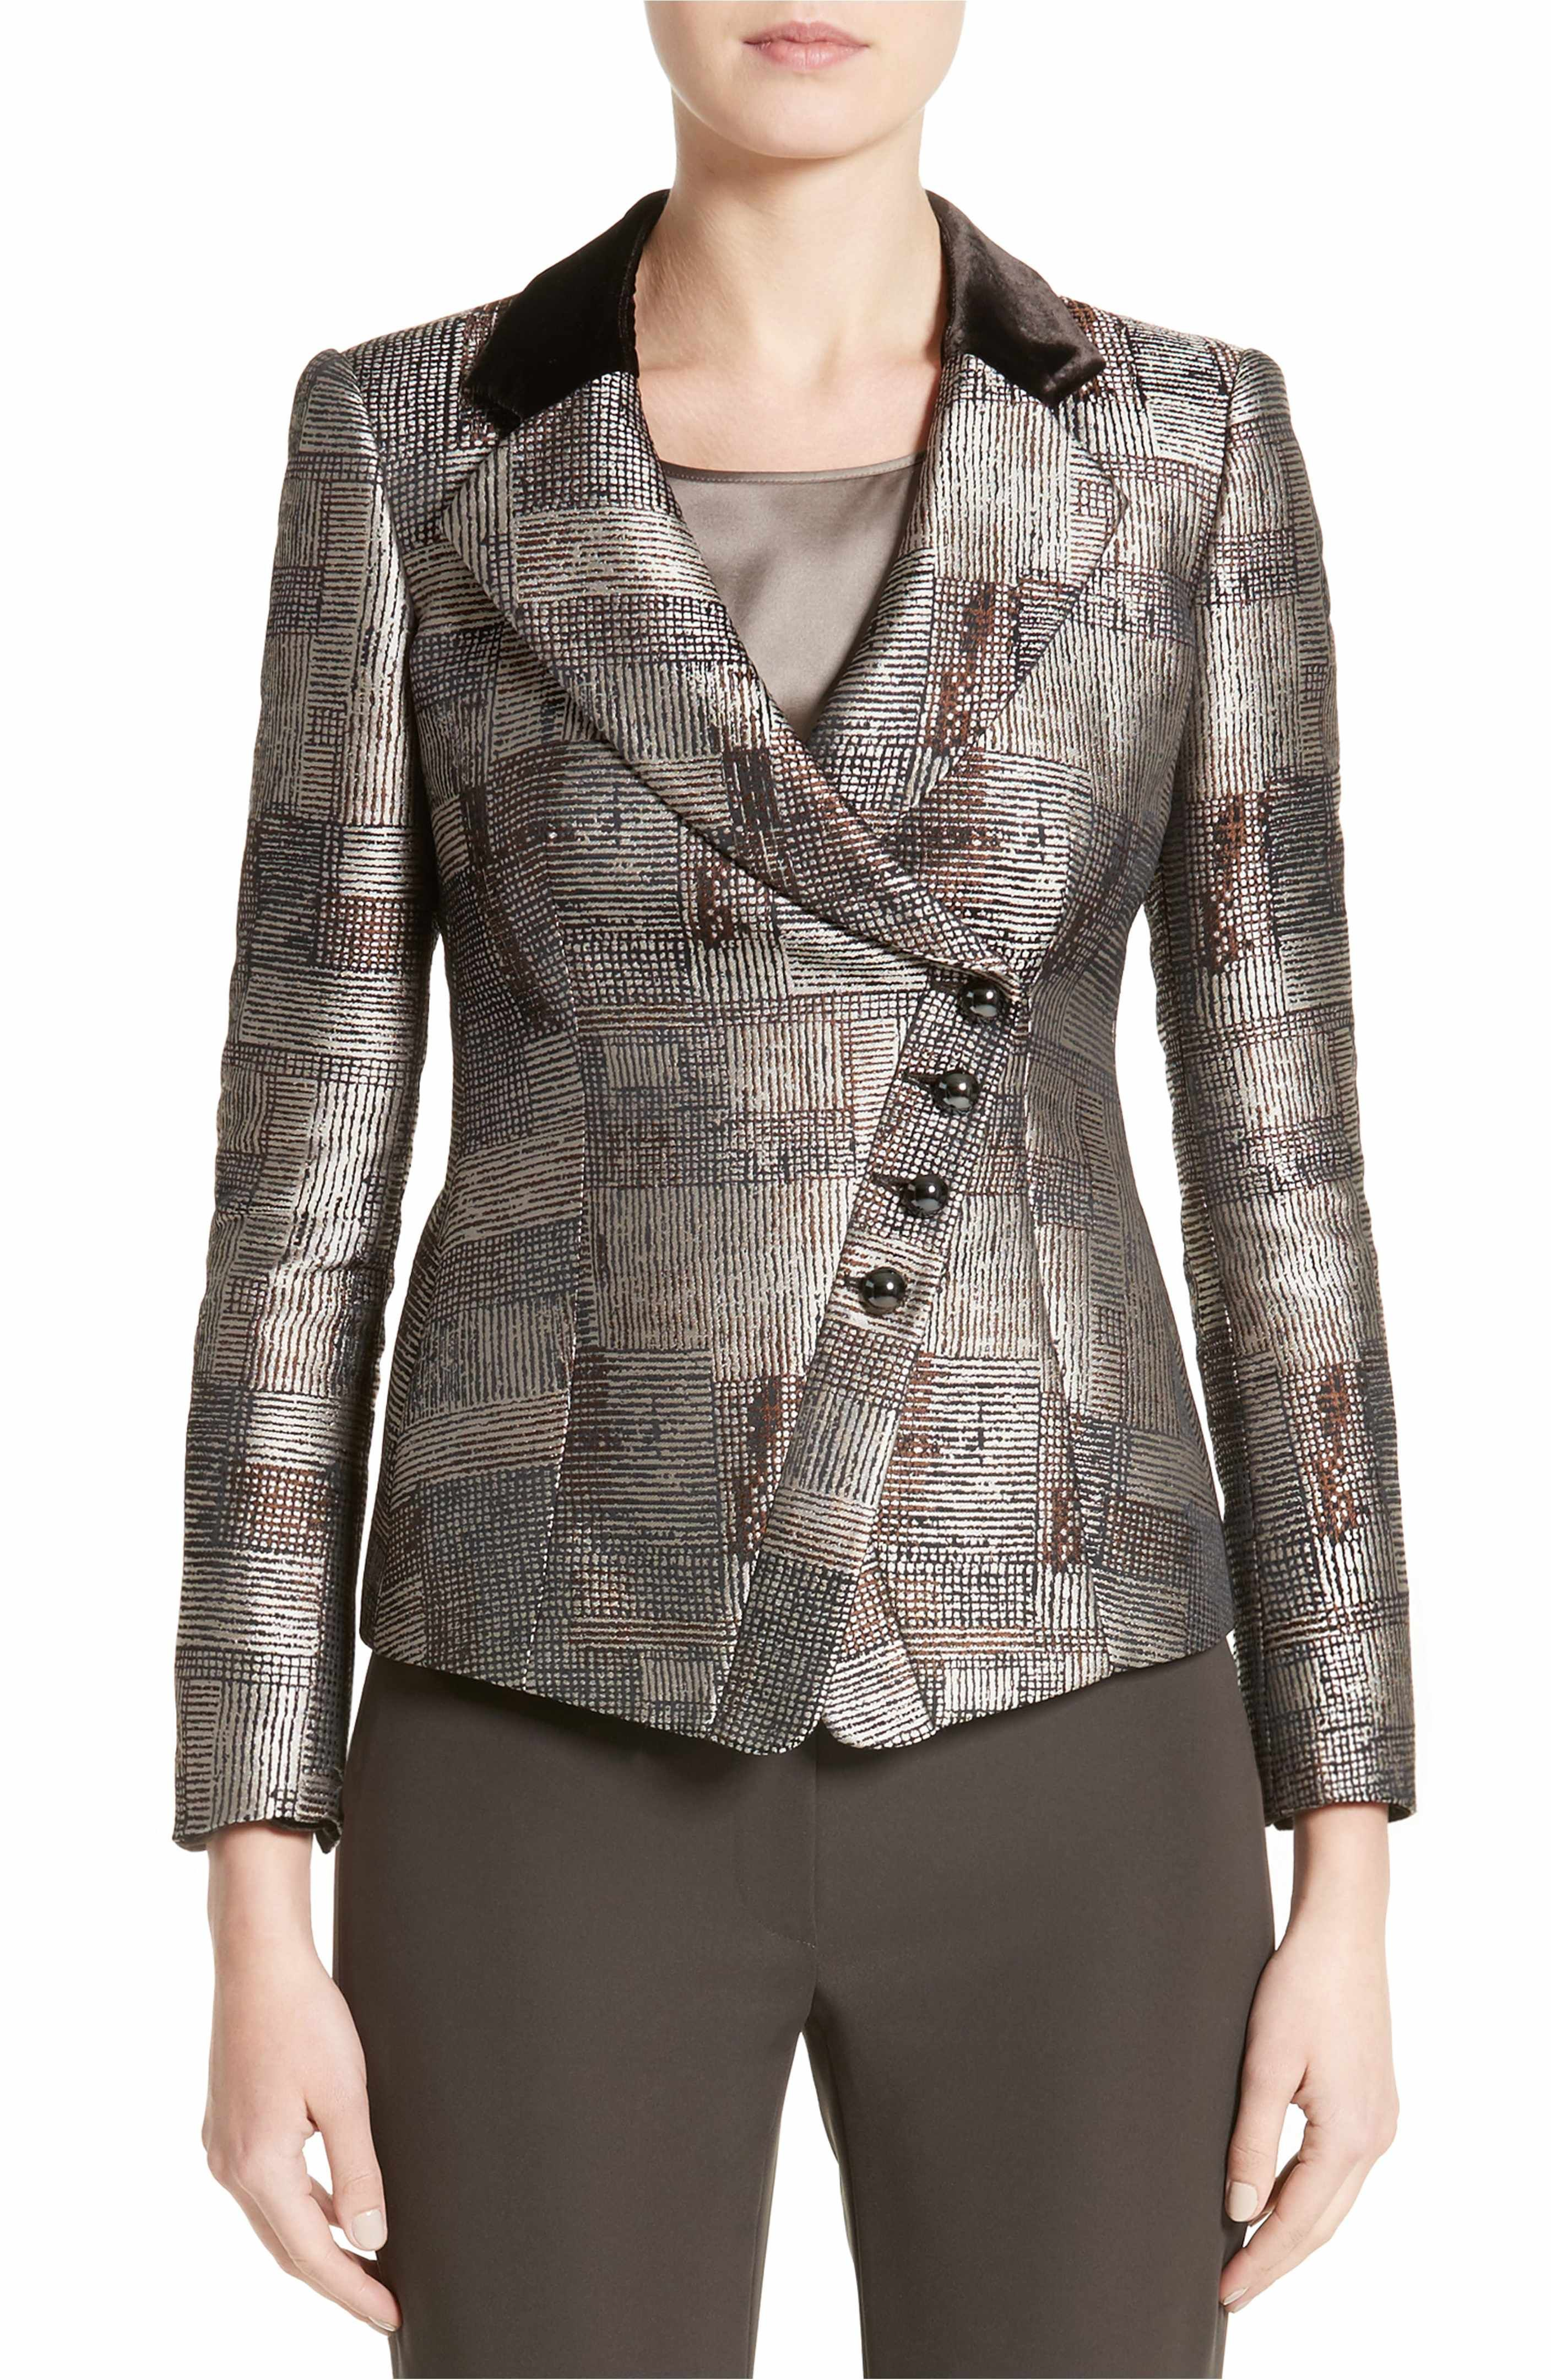 bd0a1b61e5f Main Image - Armani Collezioni Panel Jacquard Asymmetrical Jacket ...